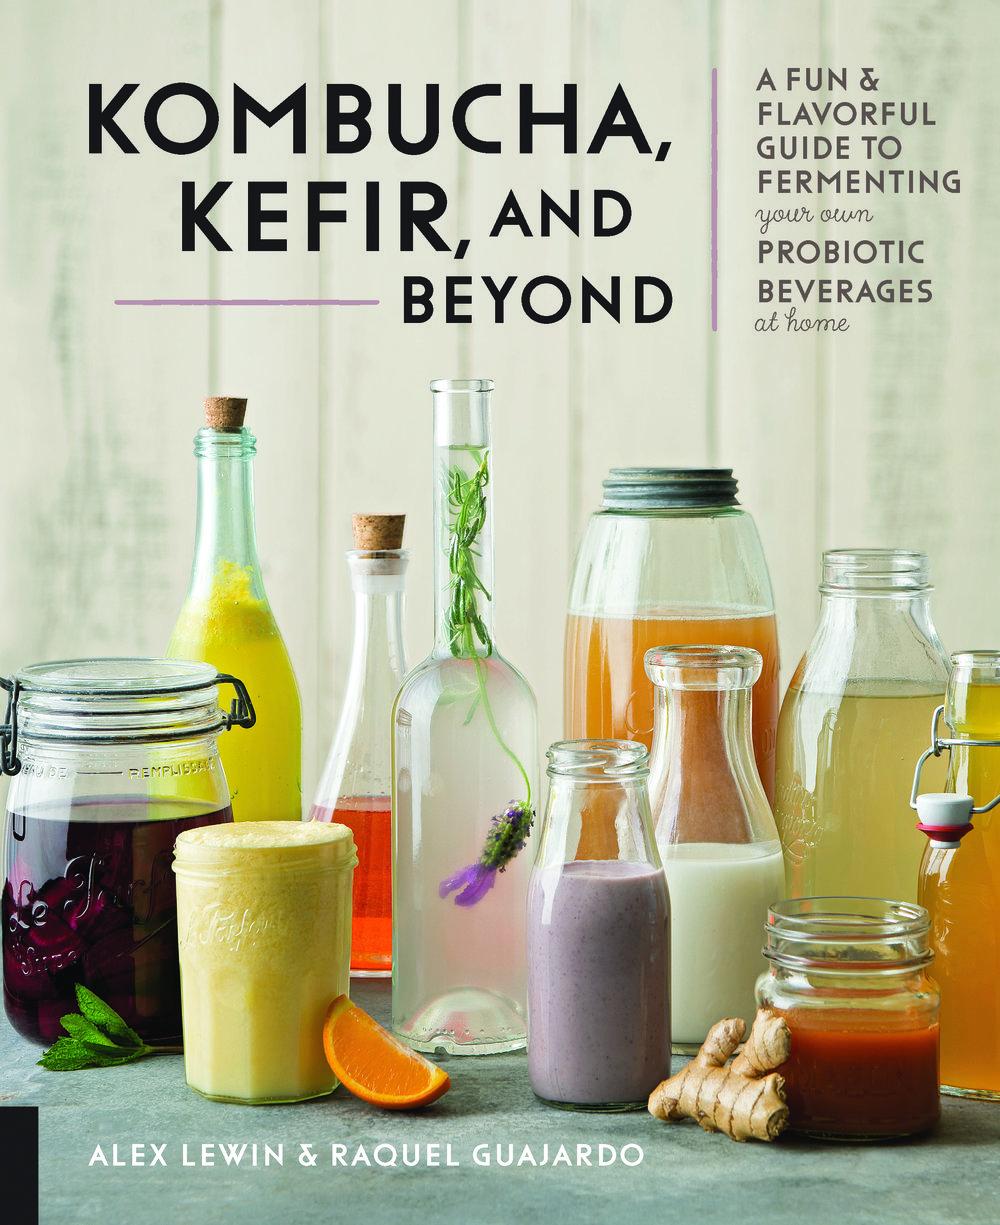 Kombucha Kefir and Beyond cover.jpg